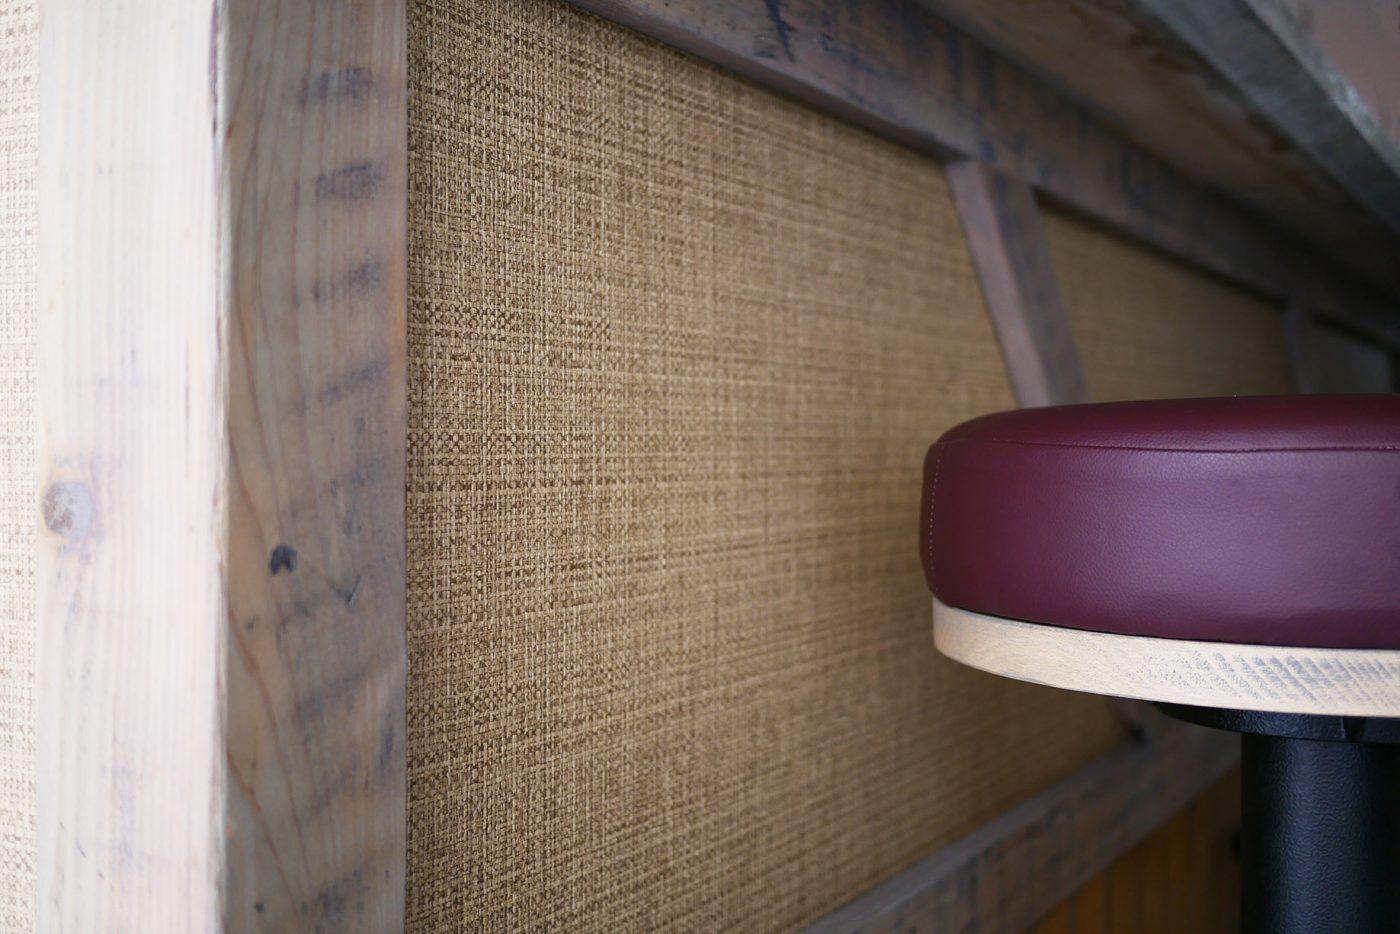 Mam_Restaurant_bar_Design_details_interior_sttol_seating_bespoke_bar